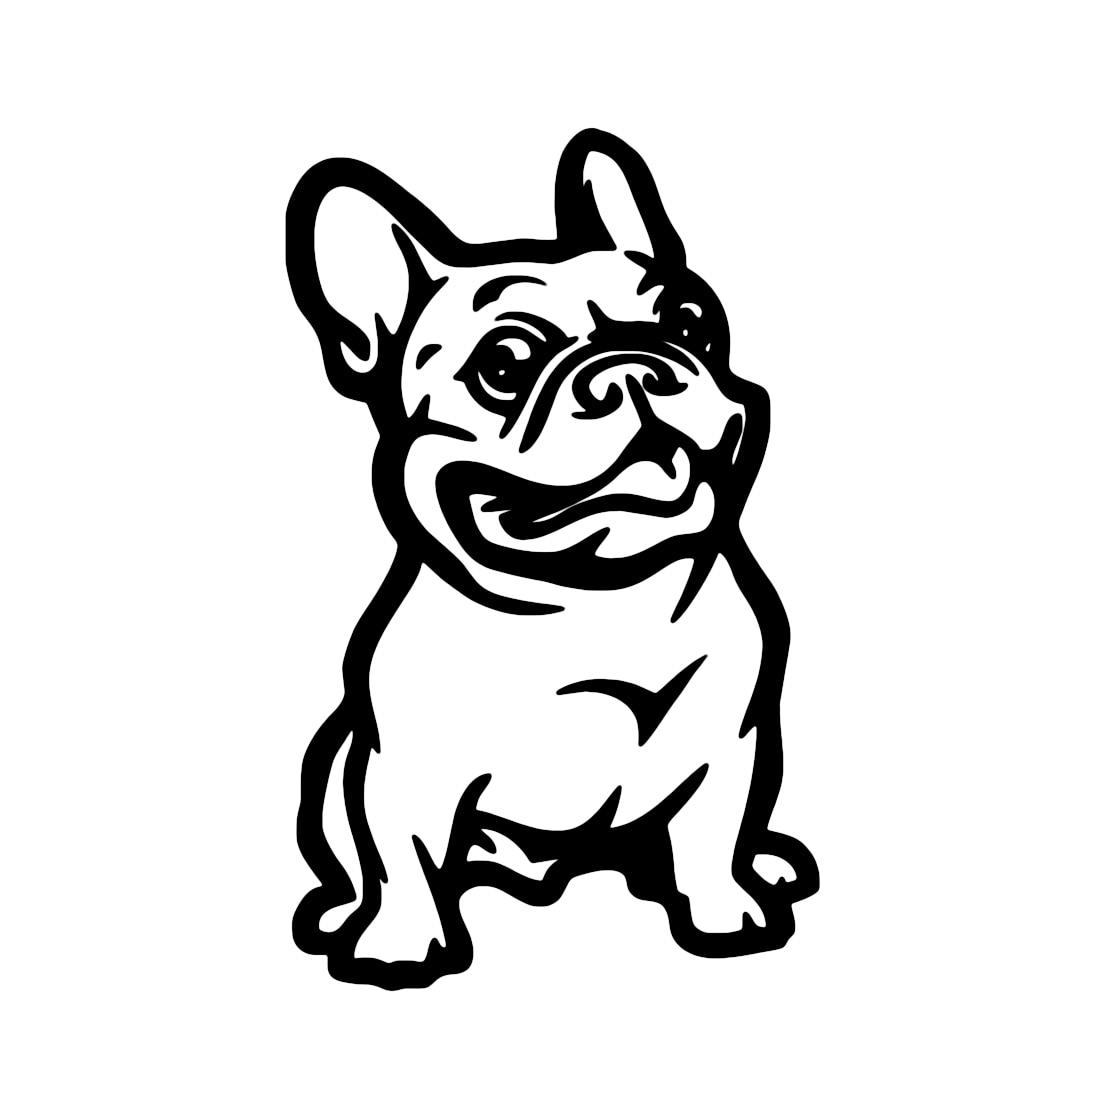 Dewtreetali CUTE French Bulldog Dog Car Sticker PET Cars Decal Weatherproof Auto Styling Cartoon Car Stickers Car Accessories